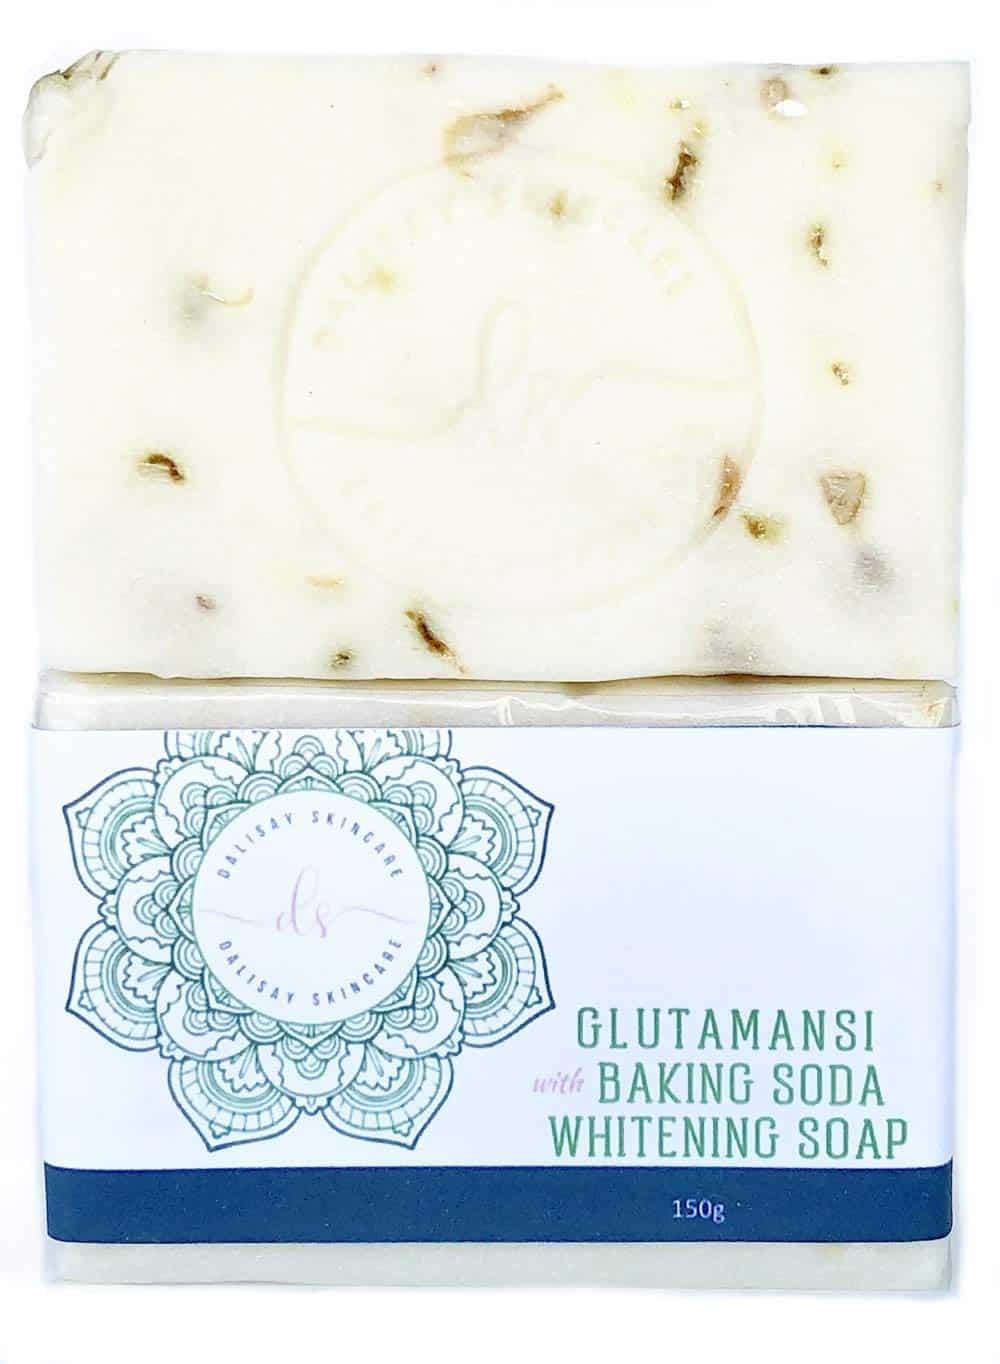 Glutamansi Skin Whitening Soap